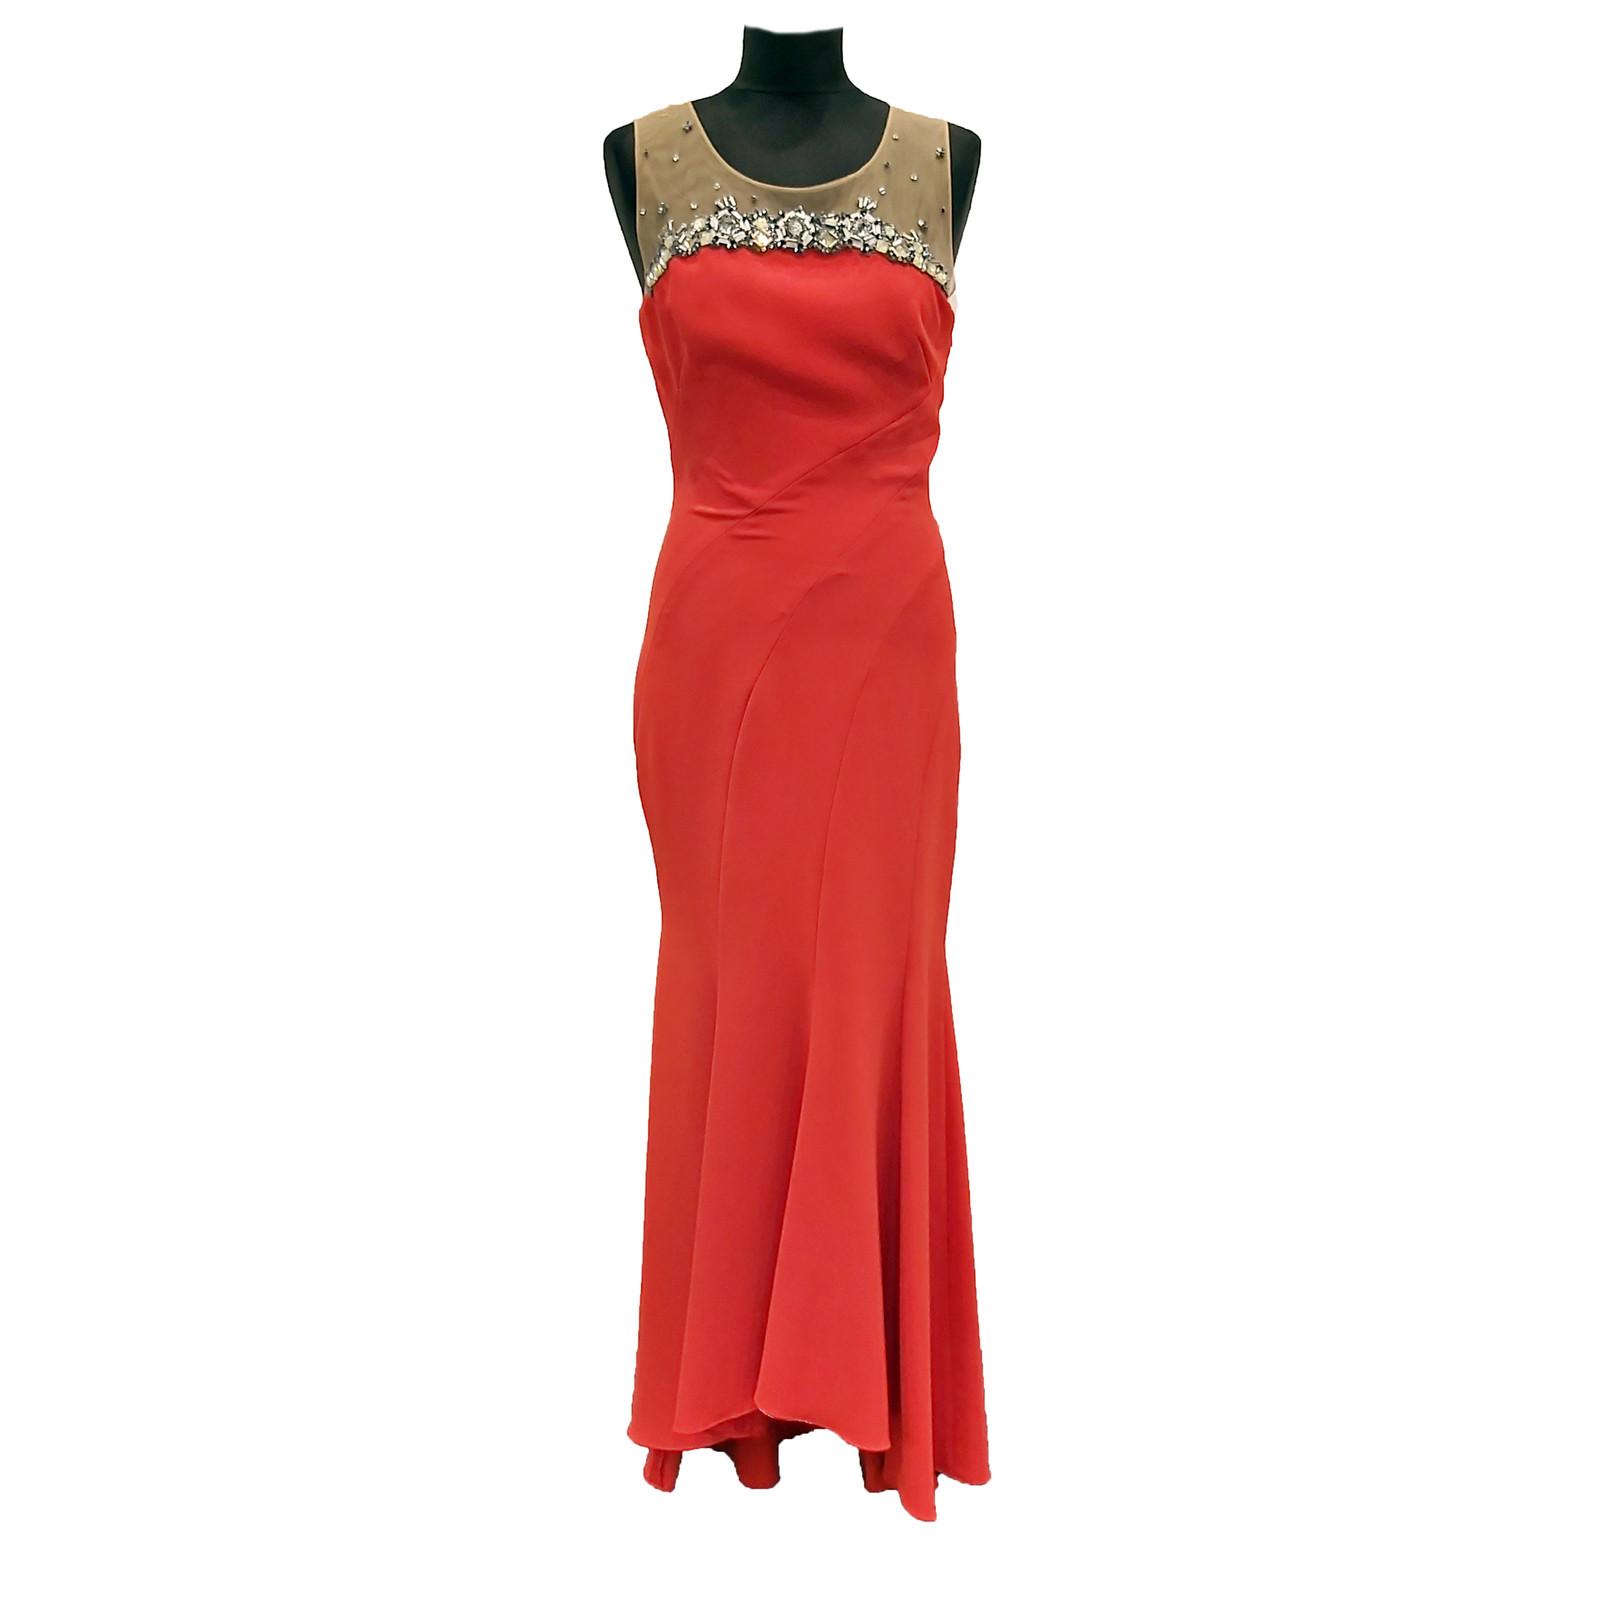 Marchesa Kleid in Rot - Second Hand Marchesa Kleid in Rot